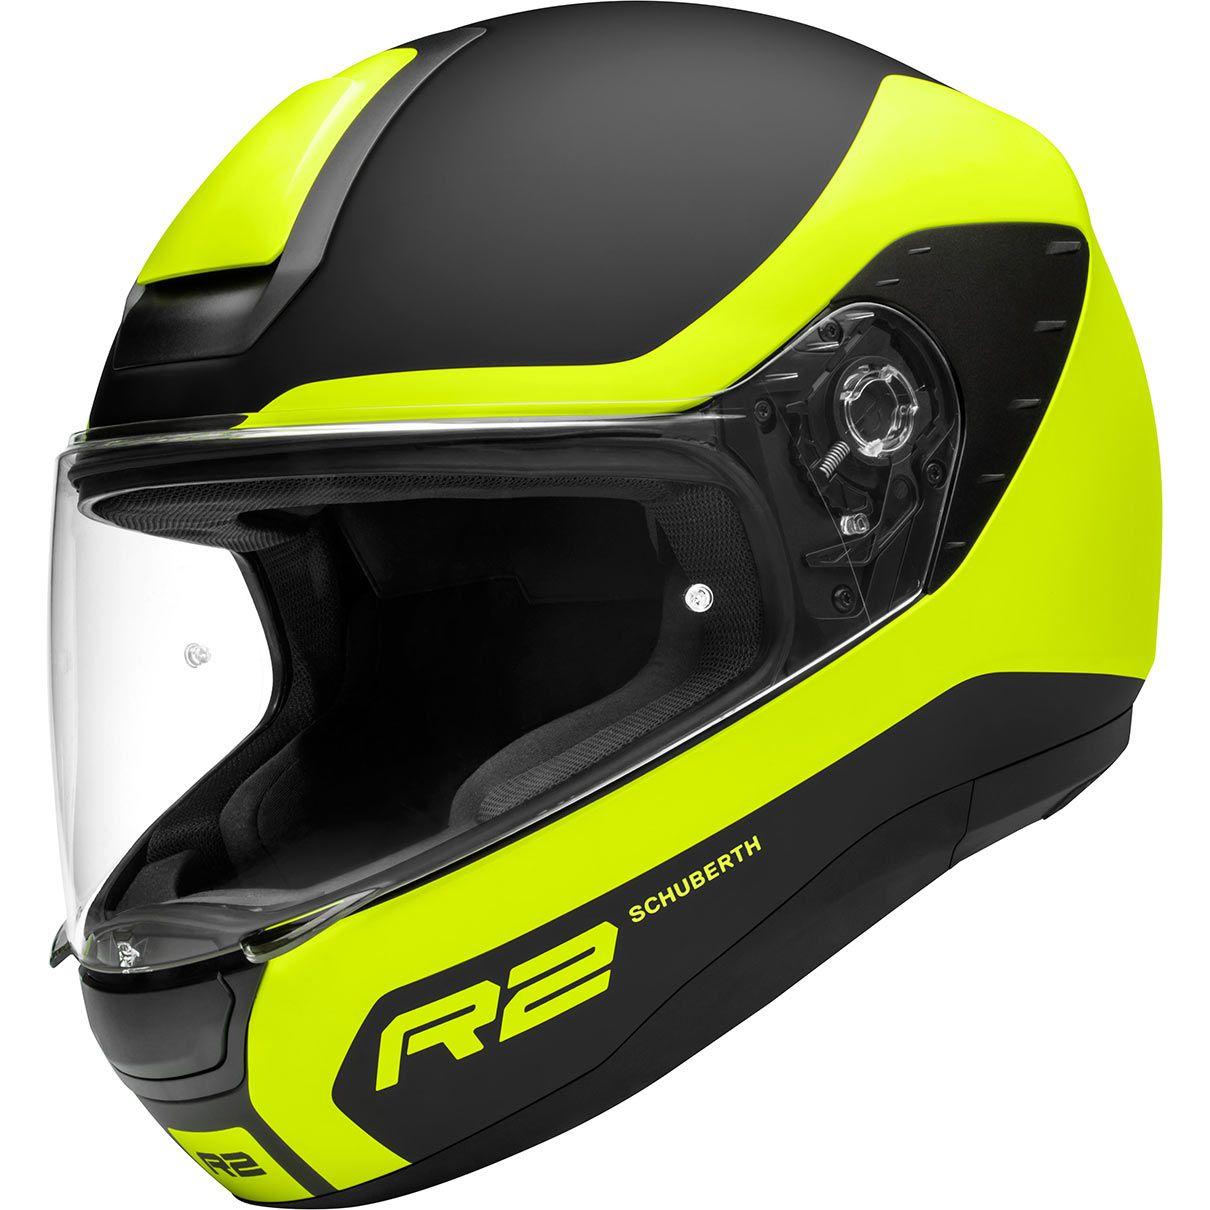 Schuberth R2 Nouveau Casque Sport Touring Moto Helmet Helmet